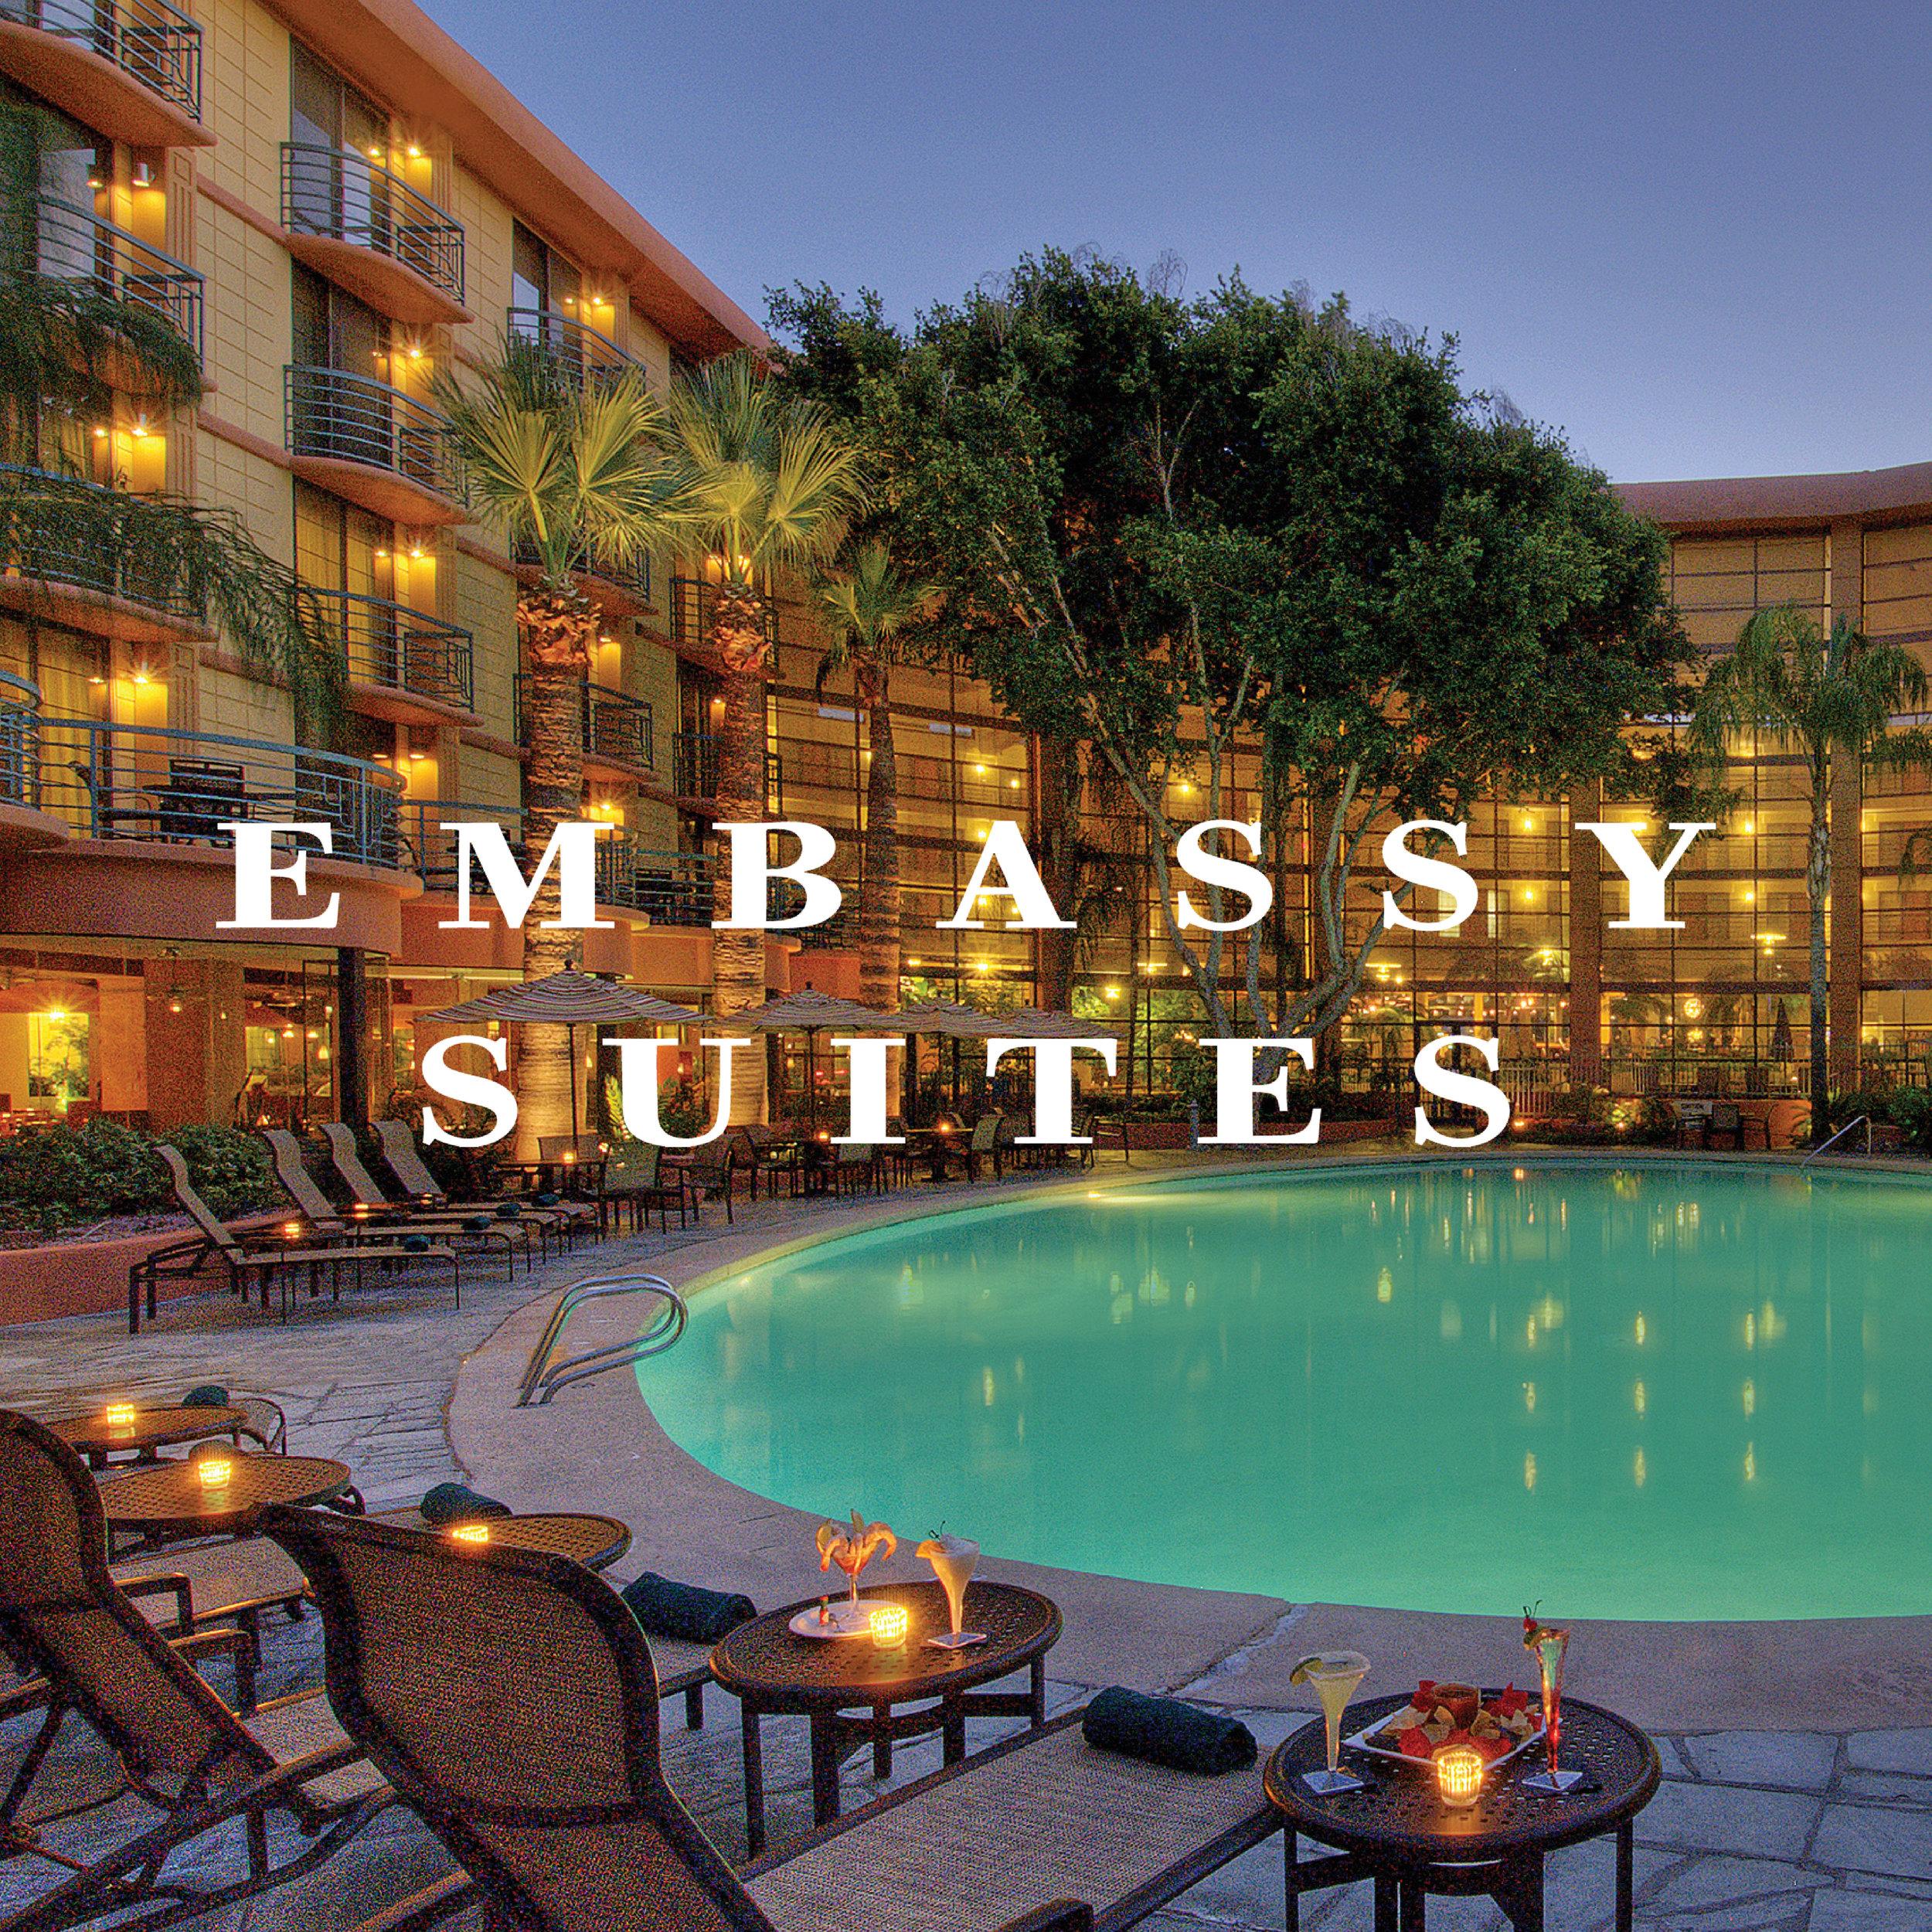 Embassy Suites (Hilton)